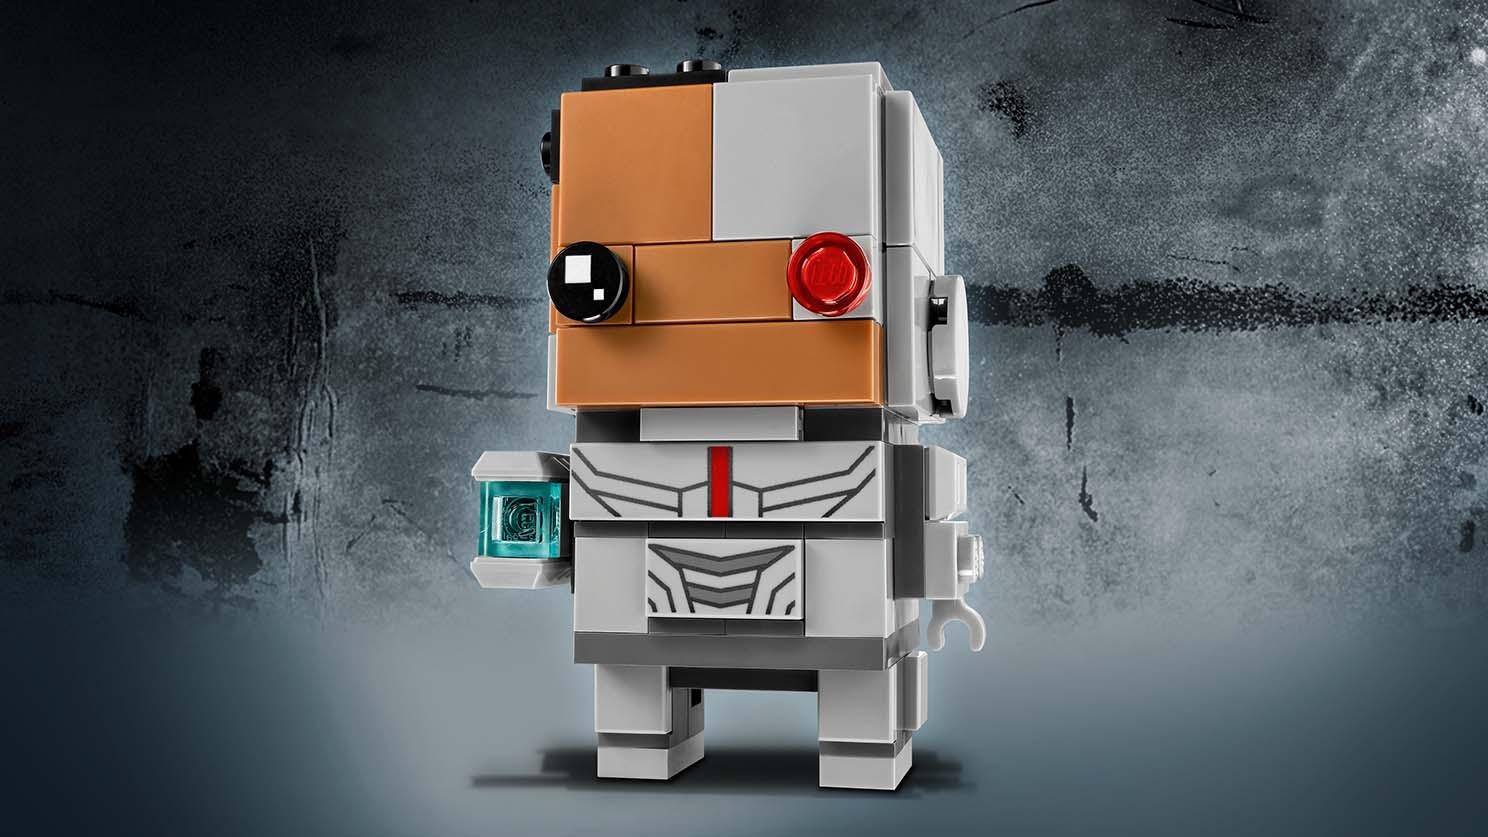 LEGO Brickheadz Cyborg - 41601 - Build the Brickheadz version of Cyborg from the Justice League movie.